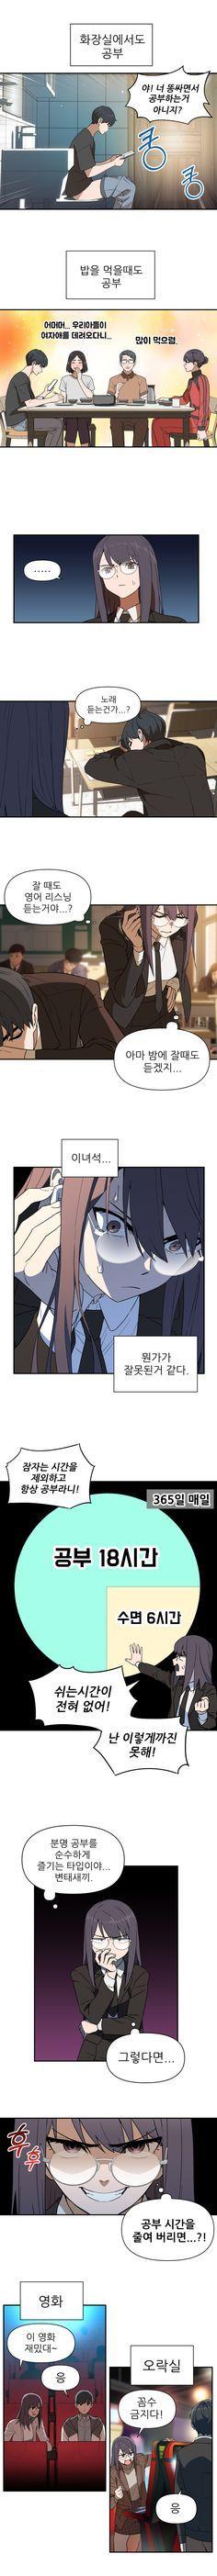 Cartoon, Manga, Comics, Drawings, Boys, Funny, Cute, Anime, Movie Posters